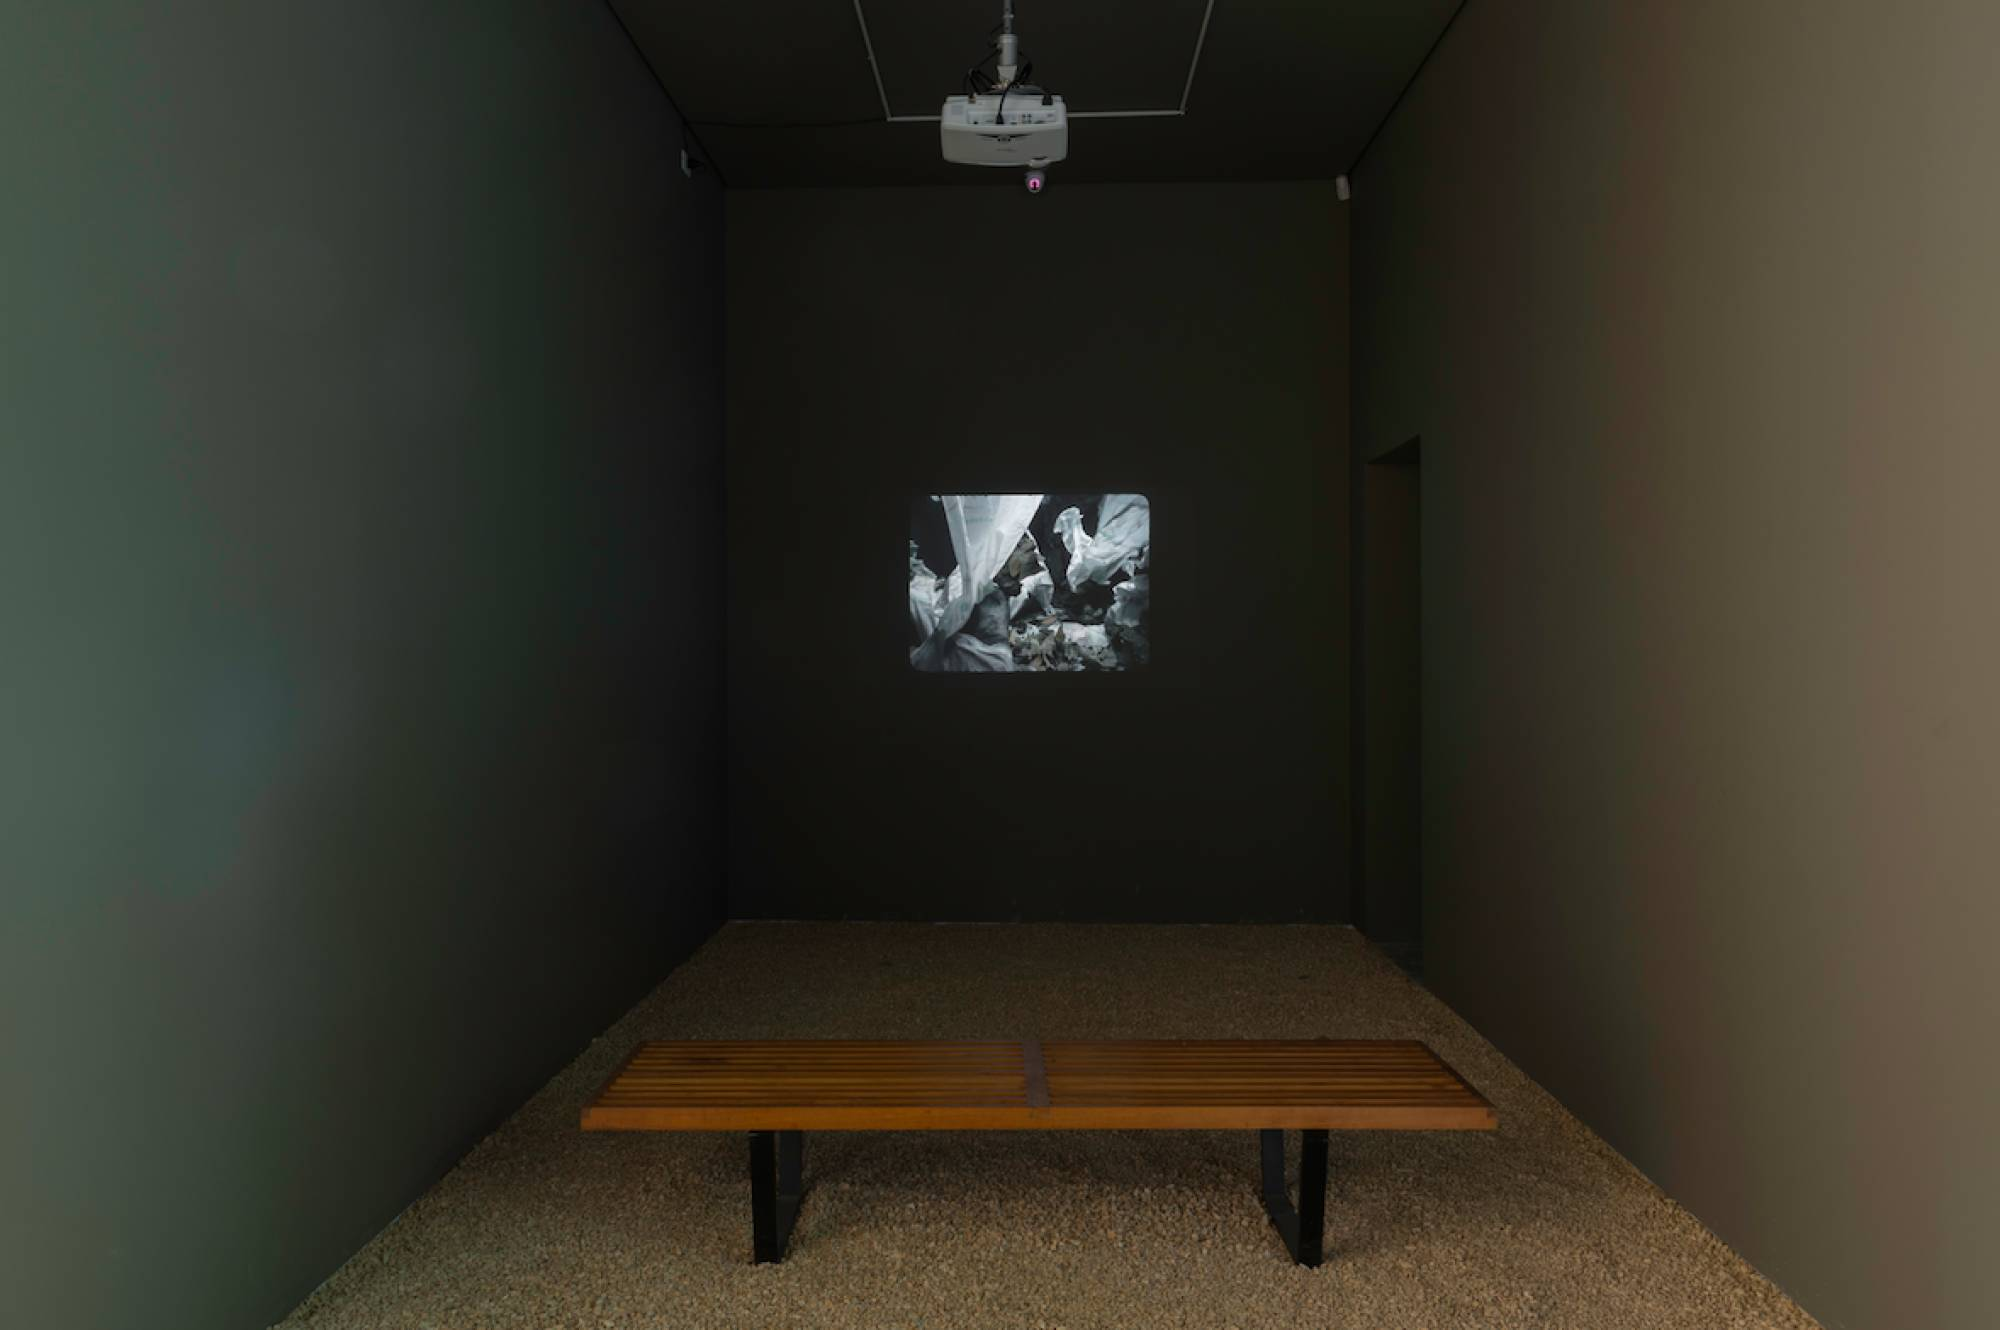 Daniel Steegmann Mangrané,<em>Phasmides</em>, Mendes Wood DM São Paulo, 2013 - Mendes Wood DM